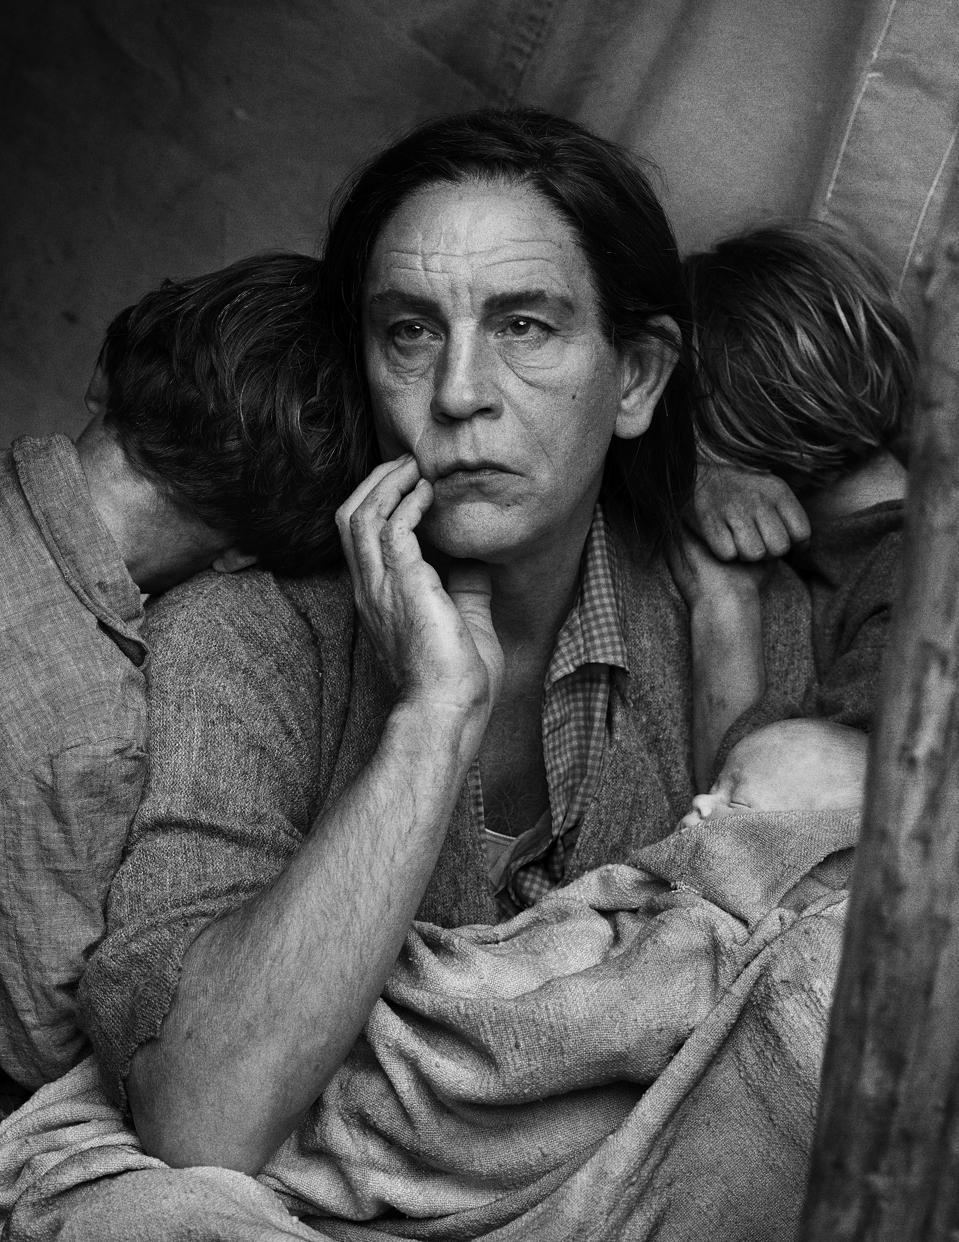 Sandro Miller after Dorothea Lange, Migrant Mother, Nipomo, California (1936), 2014.